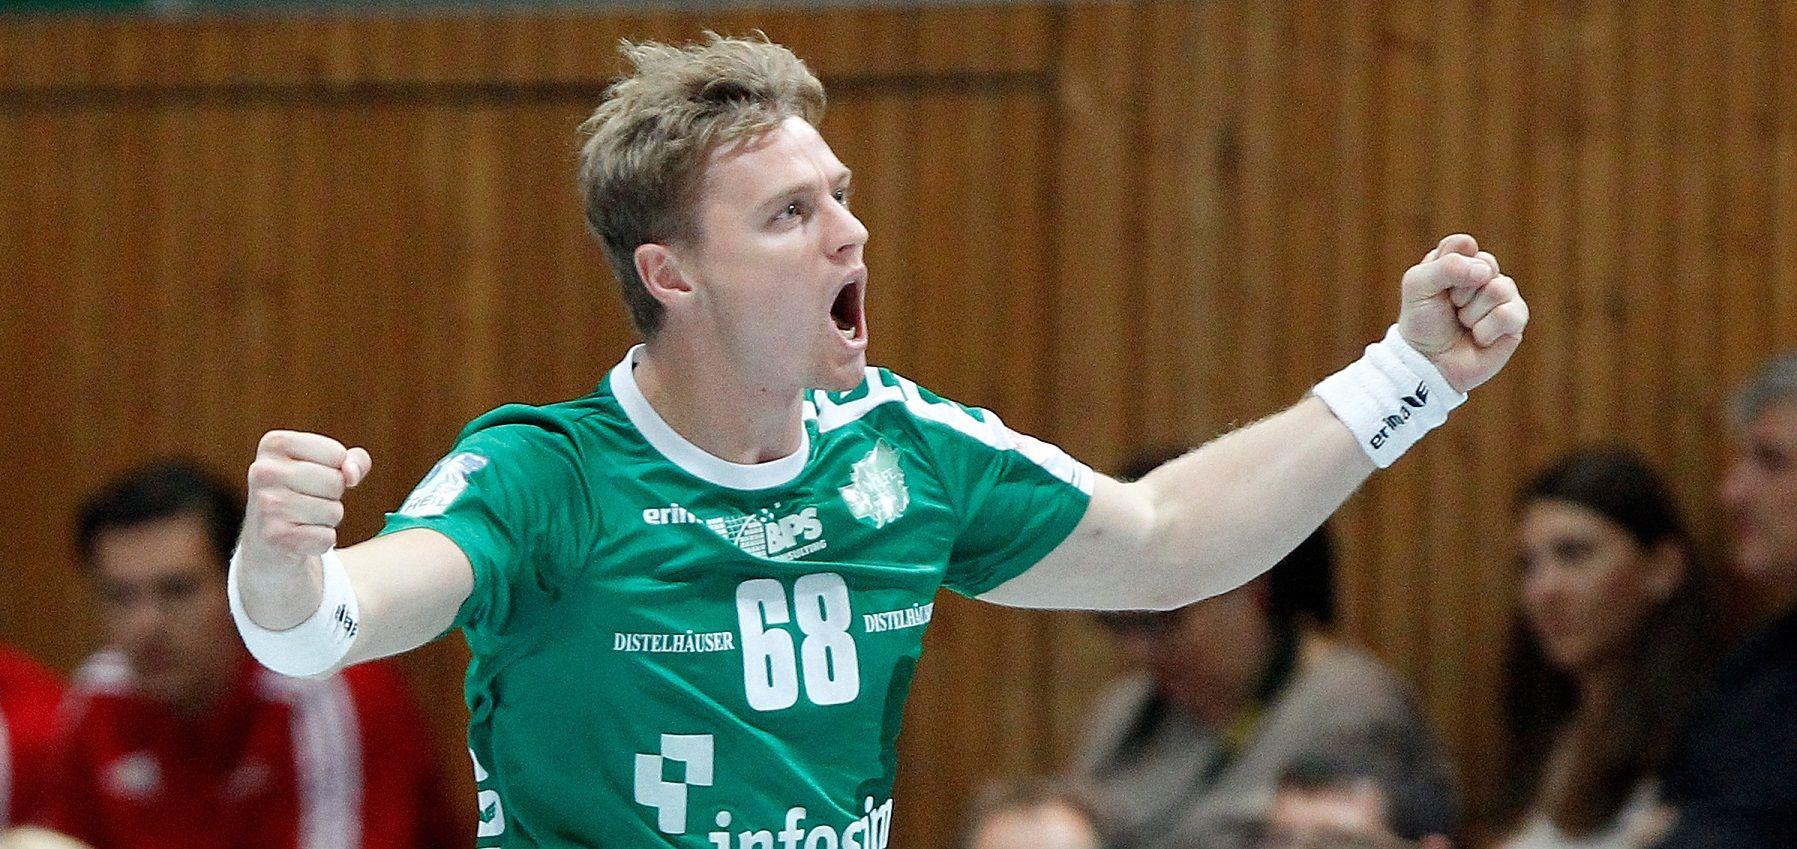 DKB 2. Handball-Bundesliga, DJK Rimpar Wölfe – TSG Lu-Friesenheim